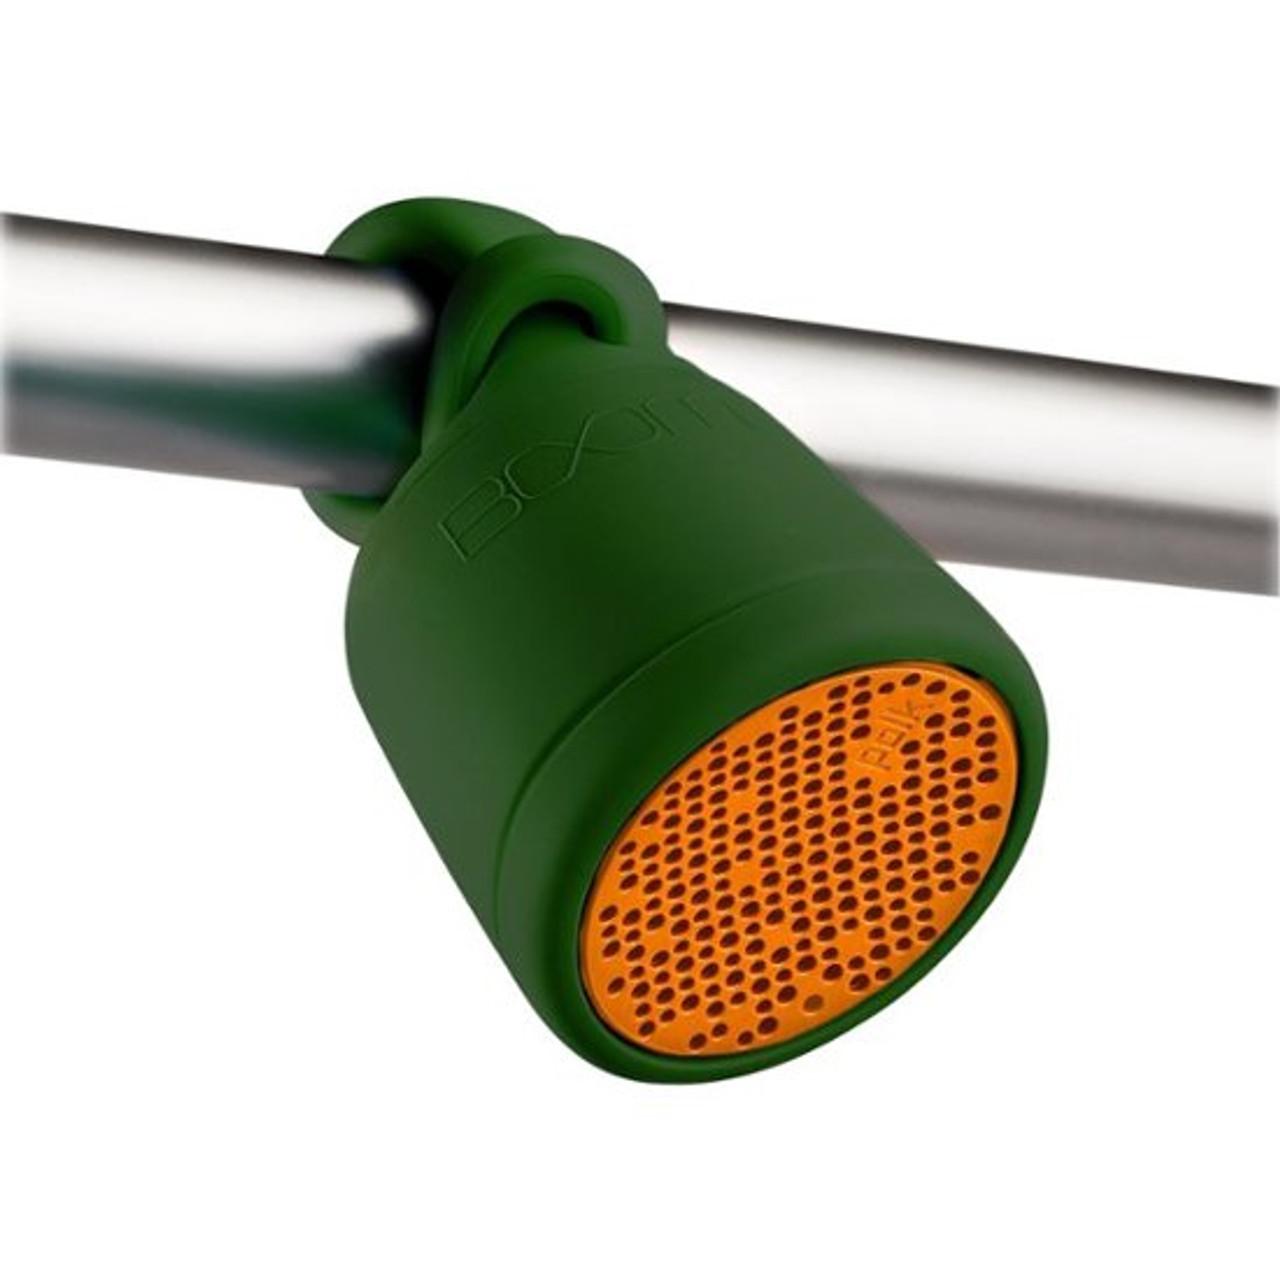 Polk Audio Boom Swimmer Bluetooth & Waterproof Speaker - Green - Refurbished - (BSMGN-A)